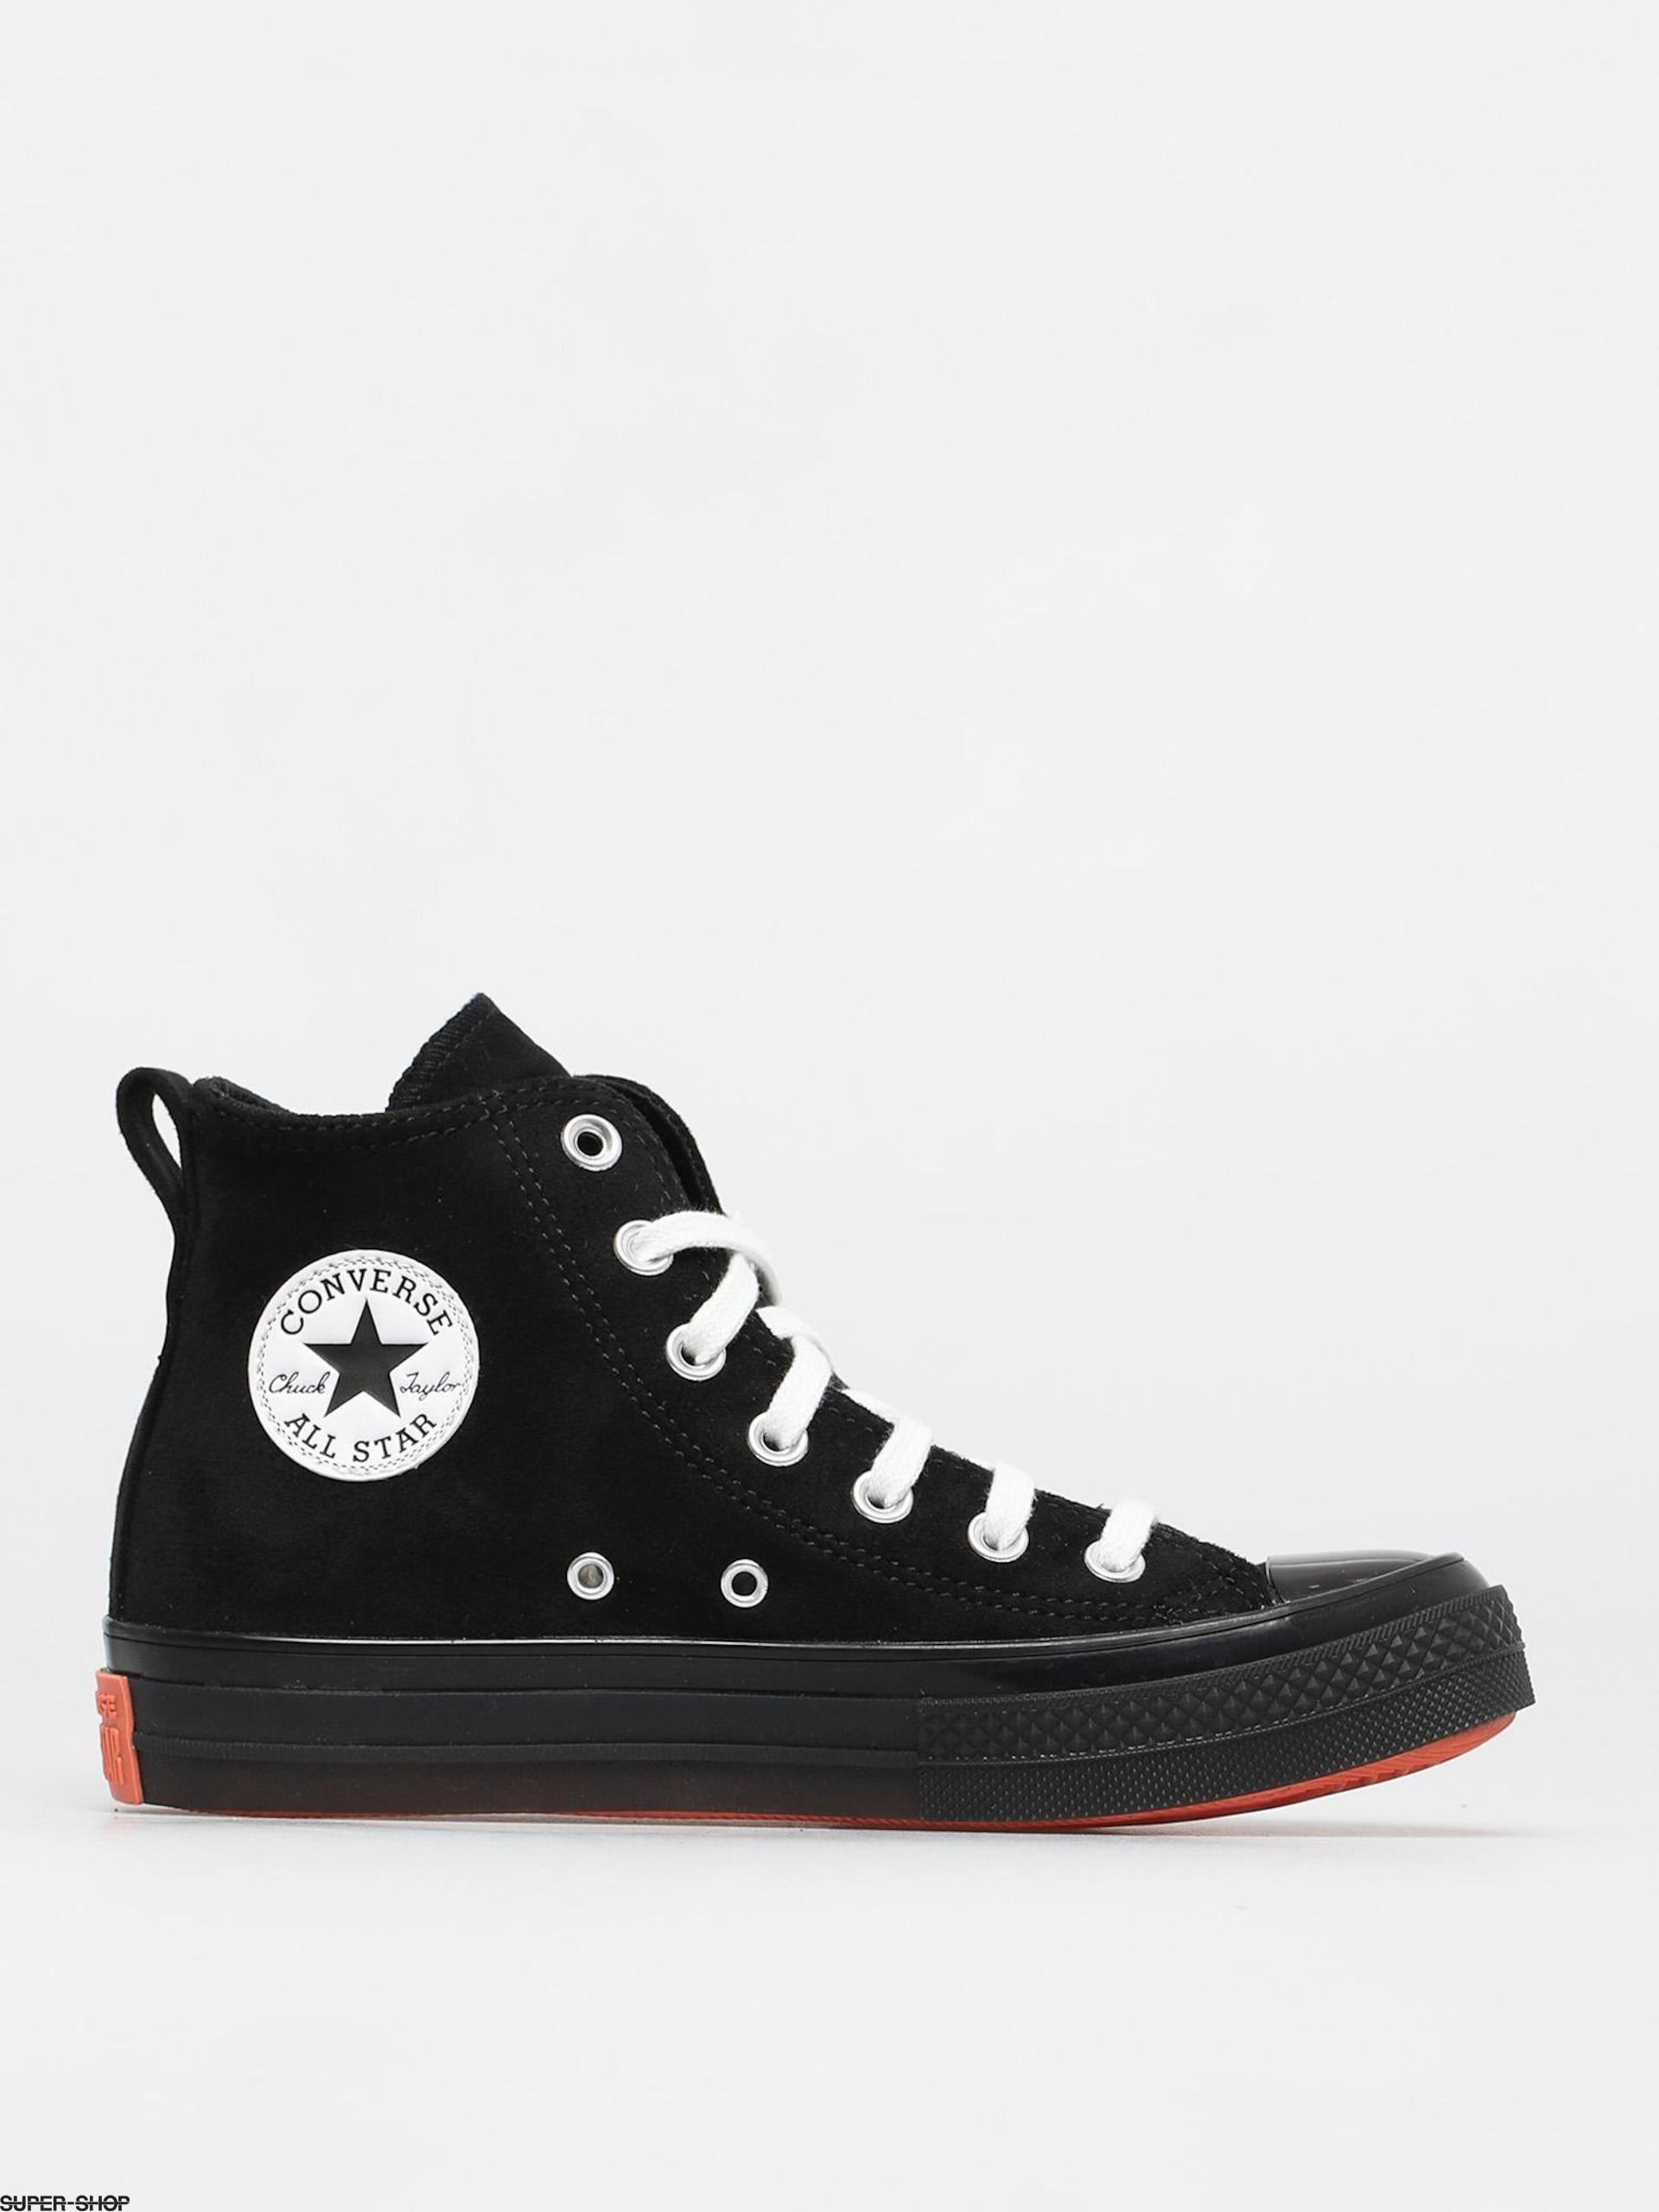 converse chucks black